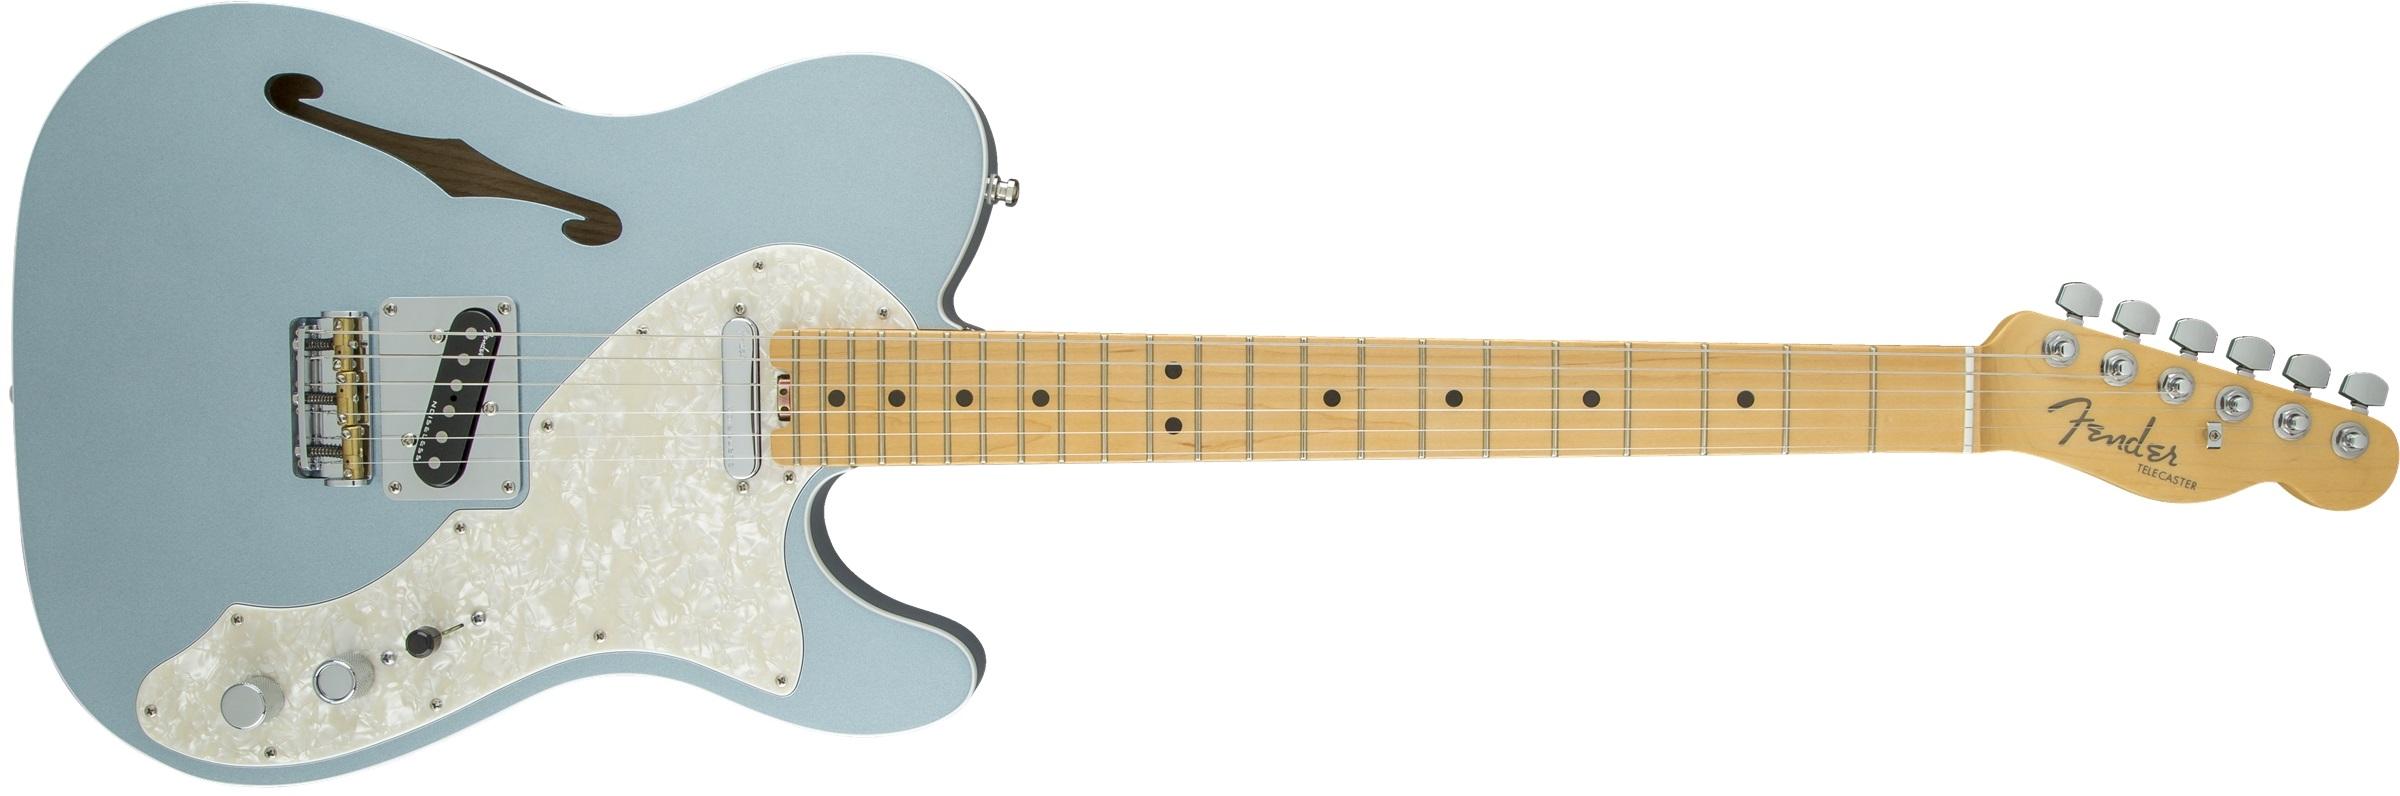 Fender American Elite Telecaster Thinline MN MIB